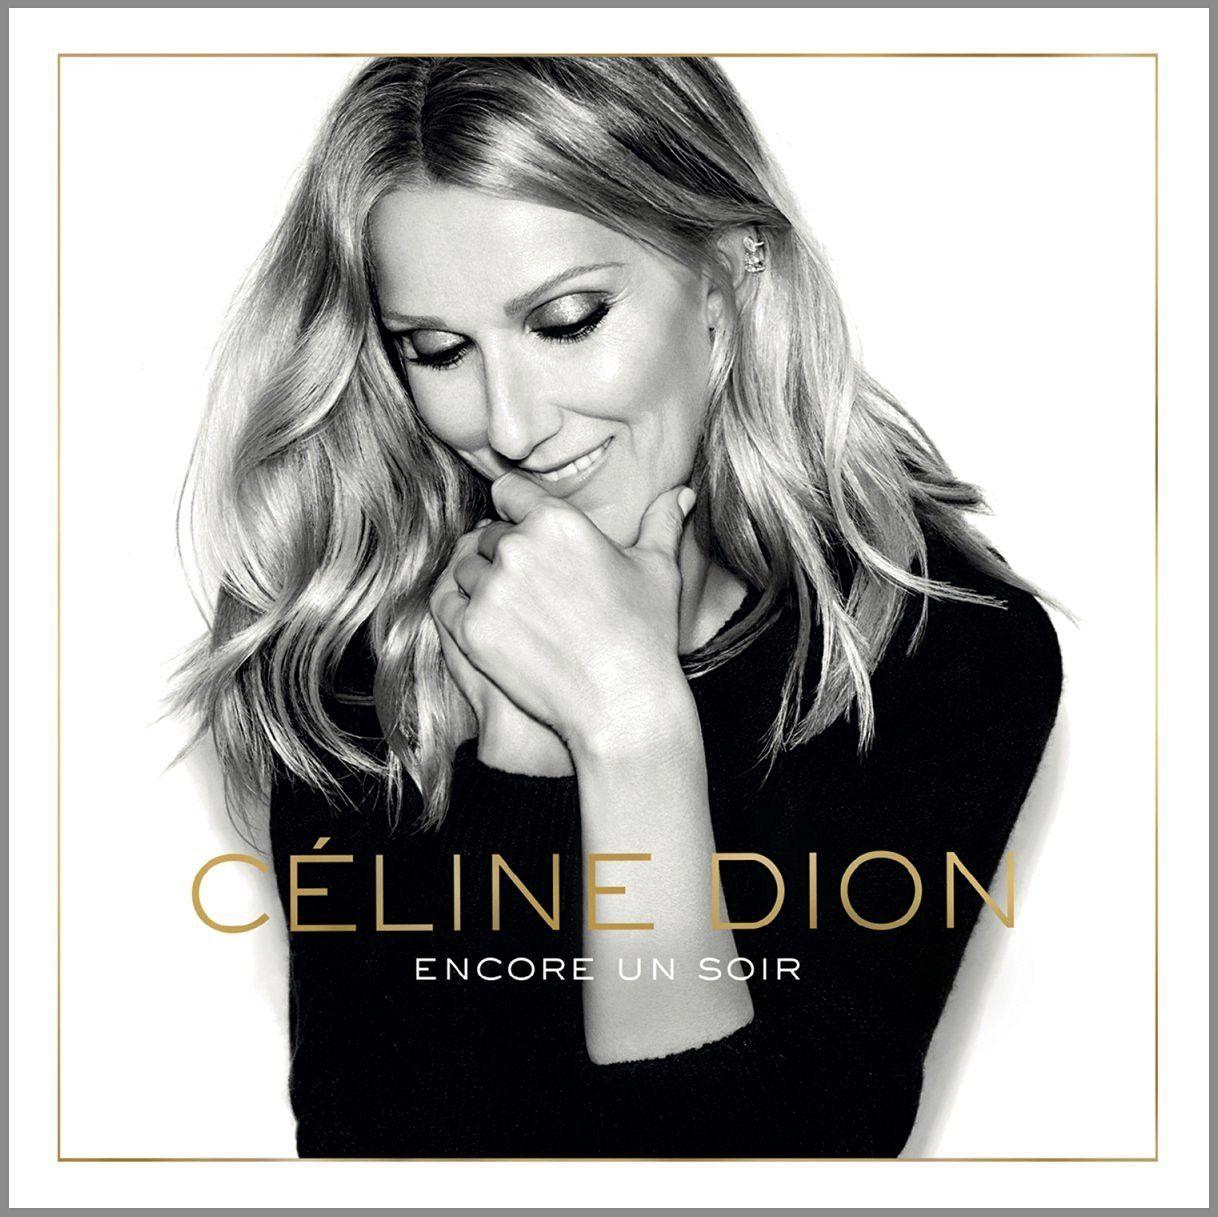 Celine Dion - Encore Un Soir on Deluxe Edition Import 2LP + CD (Backordered)